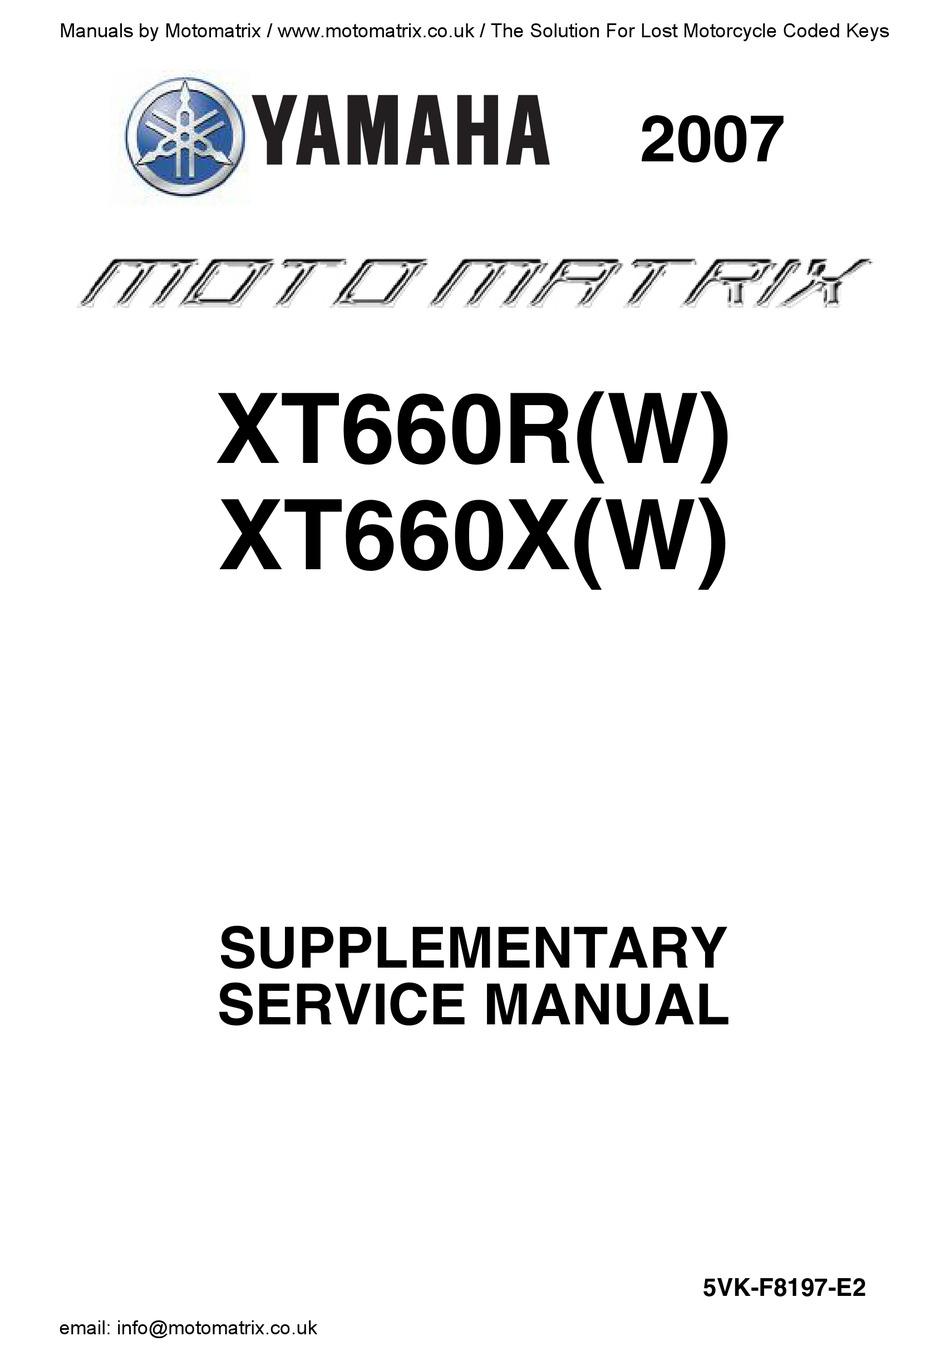 YAMAHA XT660RW 2007 SUPPLEMENTARY SERVICE MANUAL Pdf